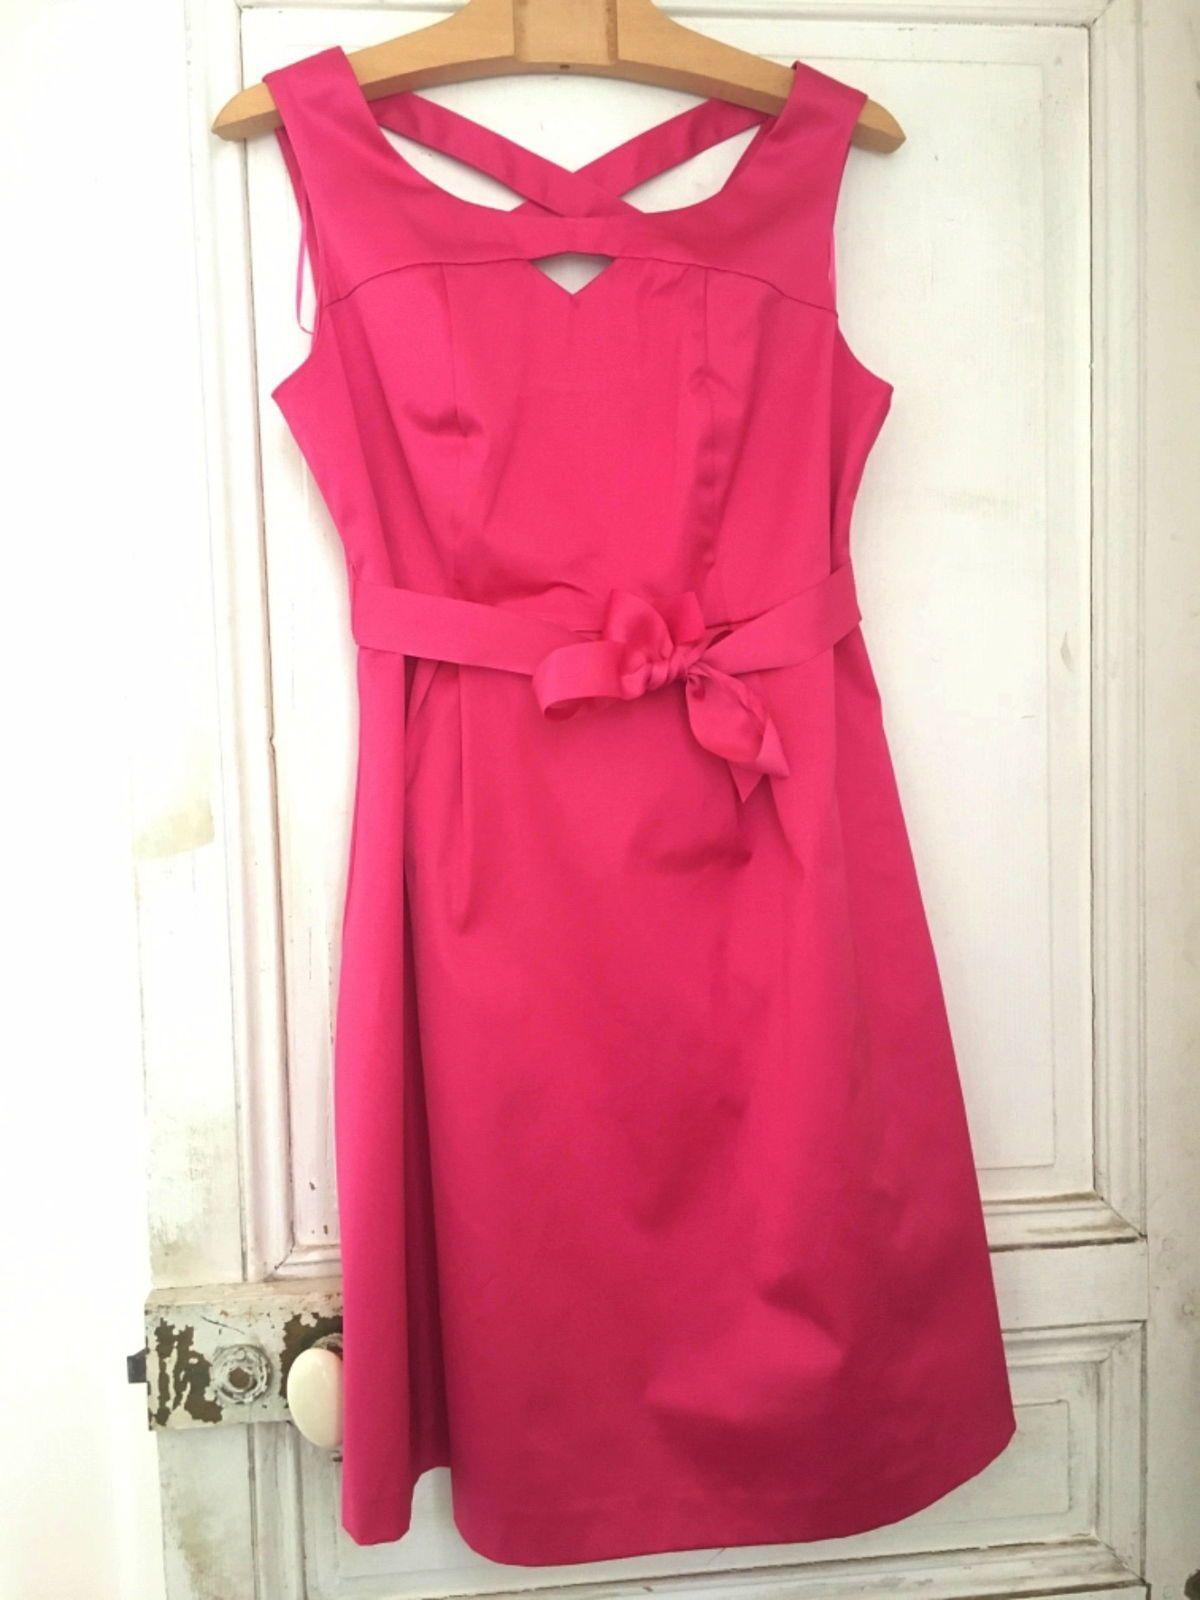 Robe rose mariage ou soirée, taille M